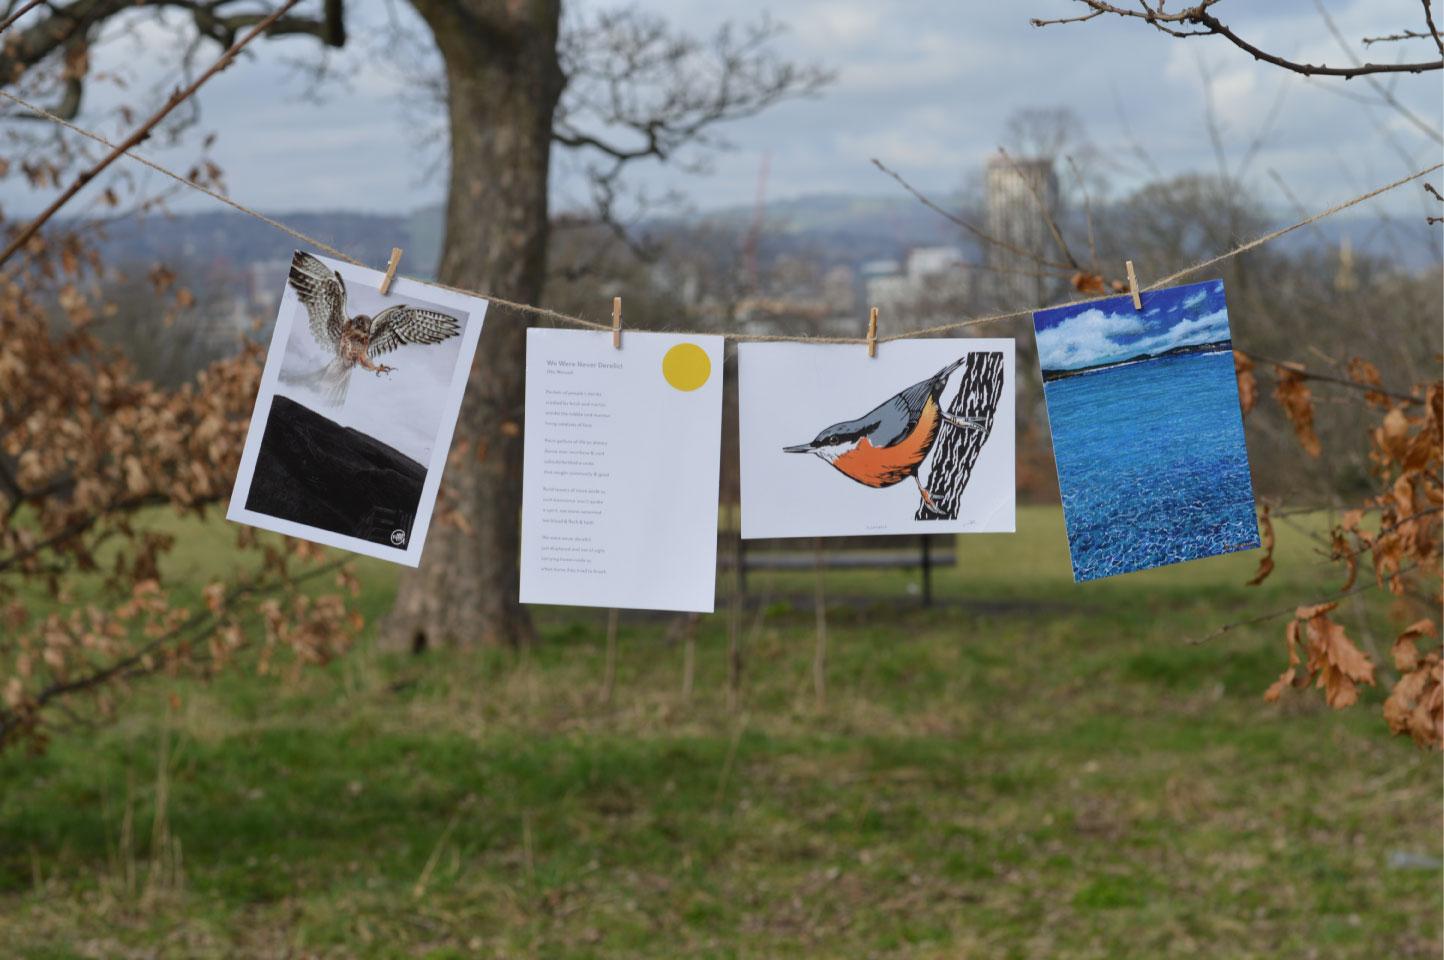 March's Art Post